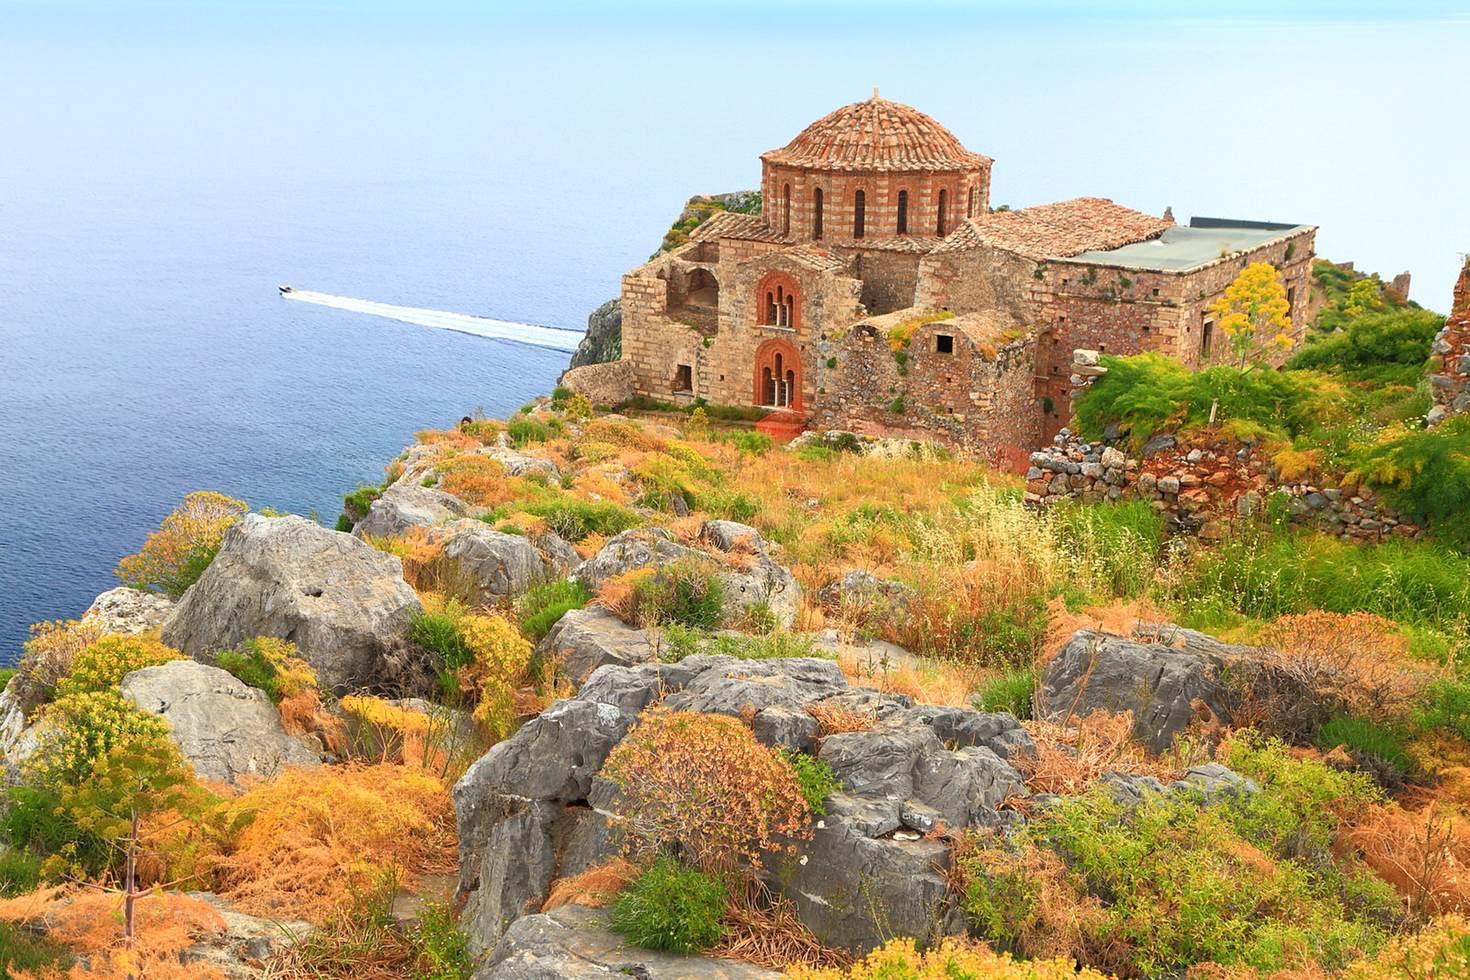 Clamber around the rock castle of Monemvasia